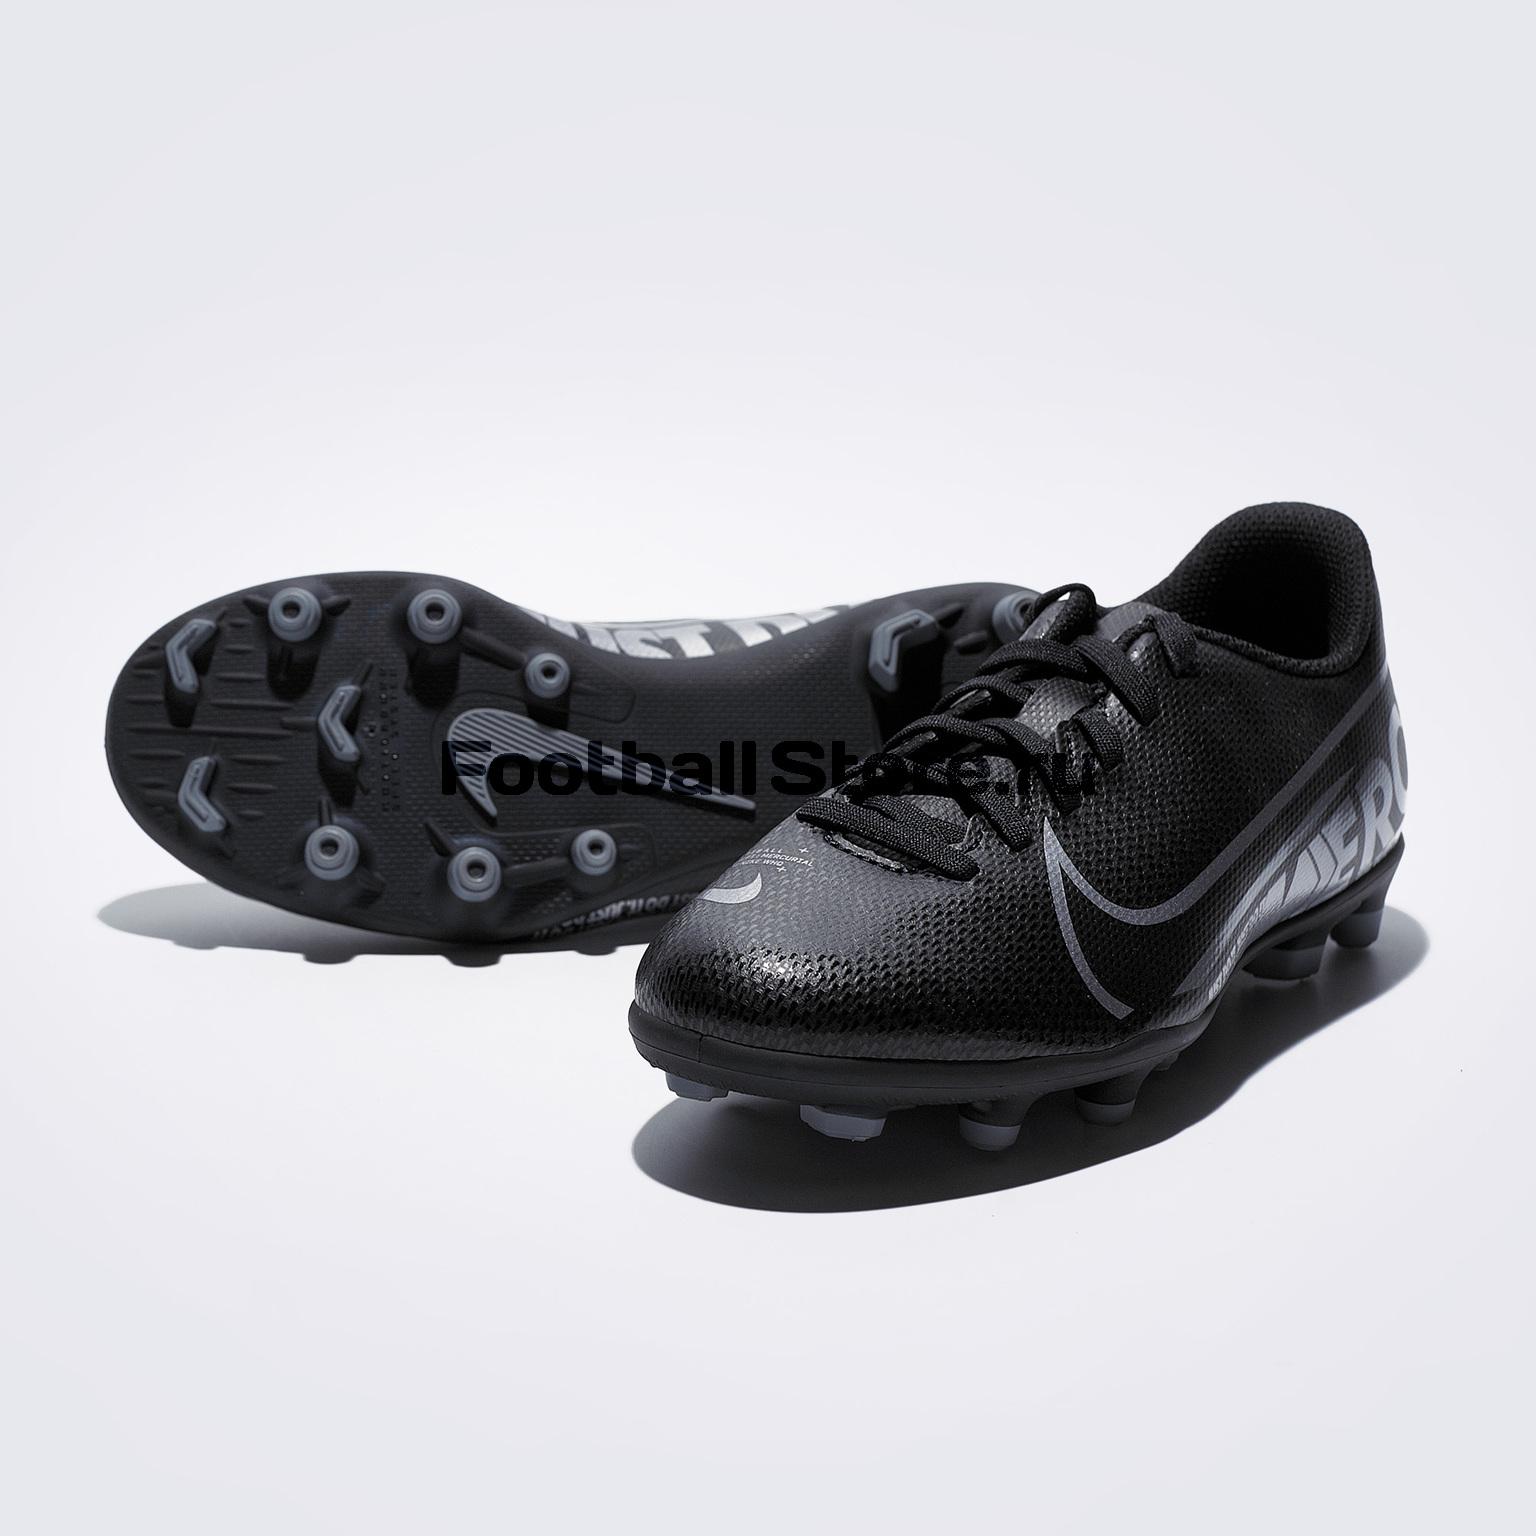 цена на Бутсы детские Nike Vapor 13 Club FG/MG AT8161-001